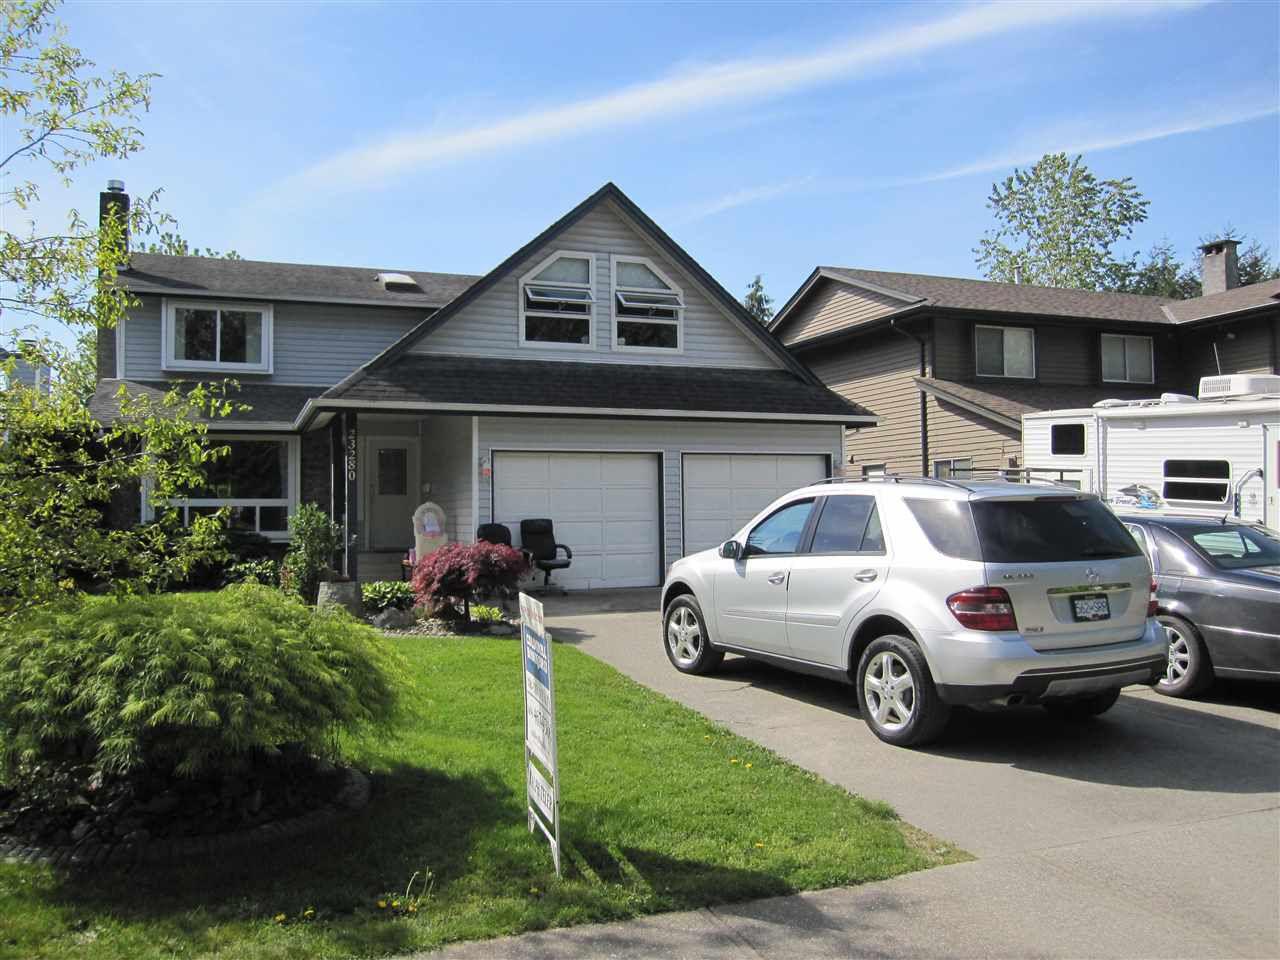 Main Photo: 23280 118 Avenue in Maple Ridge: Cottonwood MR House for sale : MLS®# R2058879